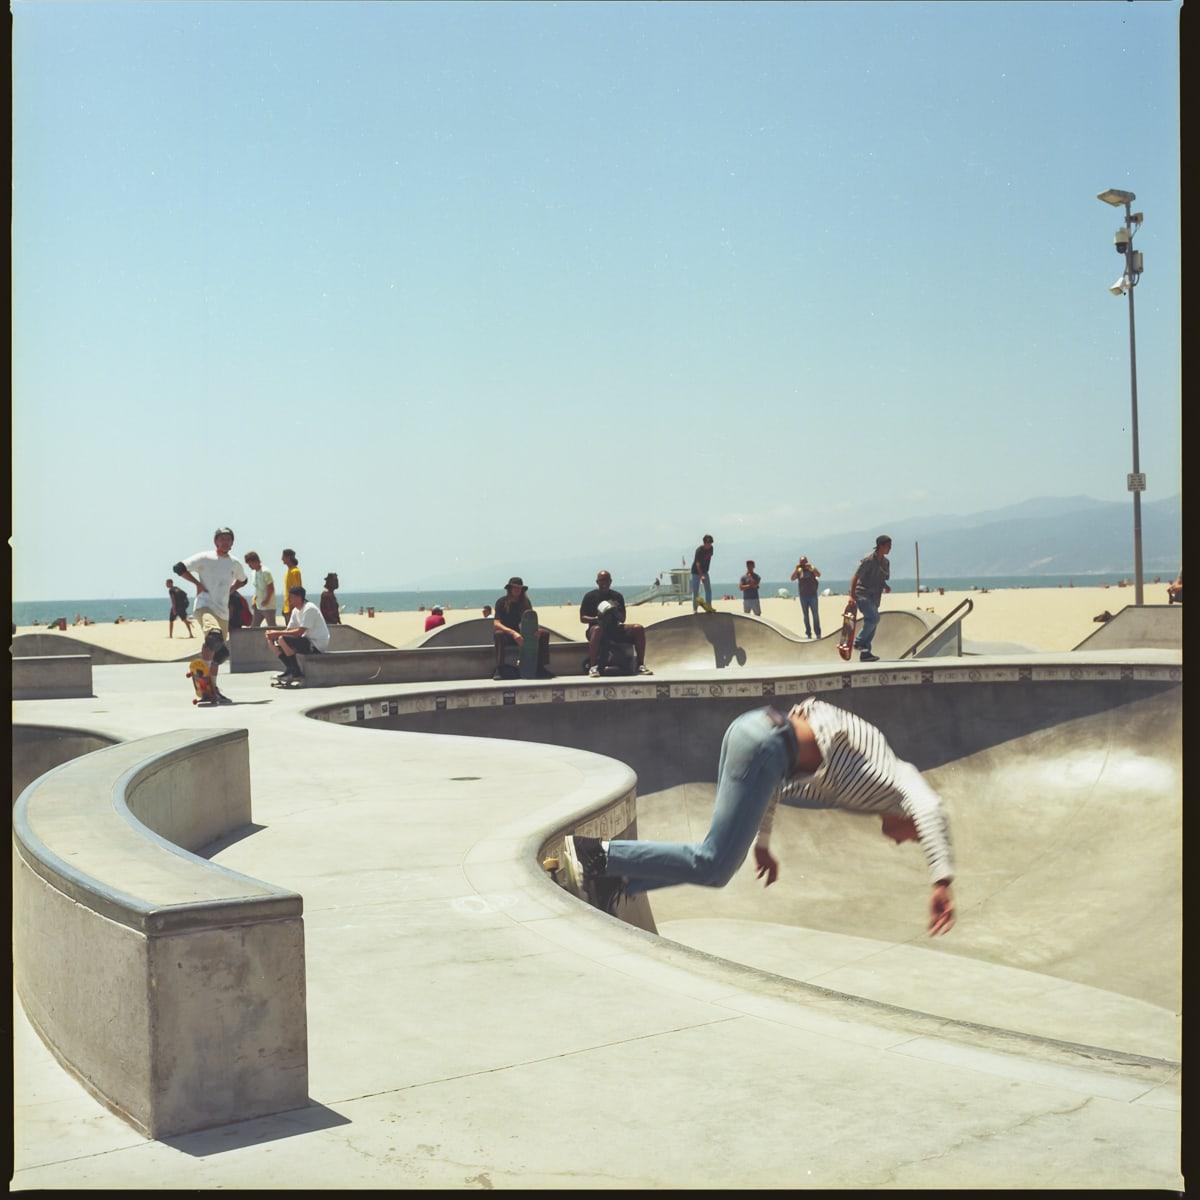 Skateboarders at the Venice Beach skatepark